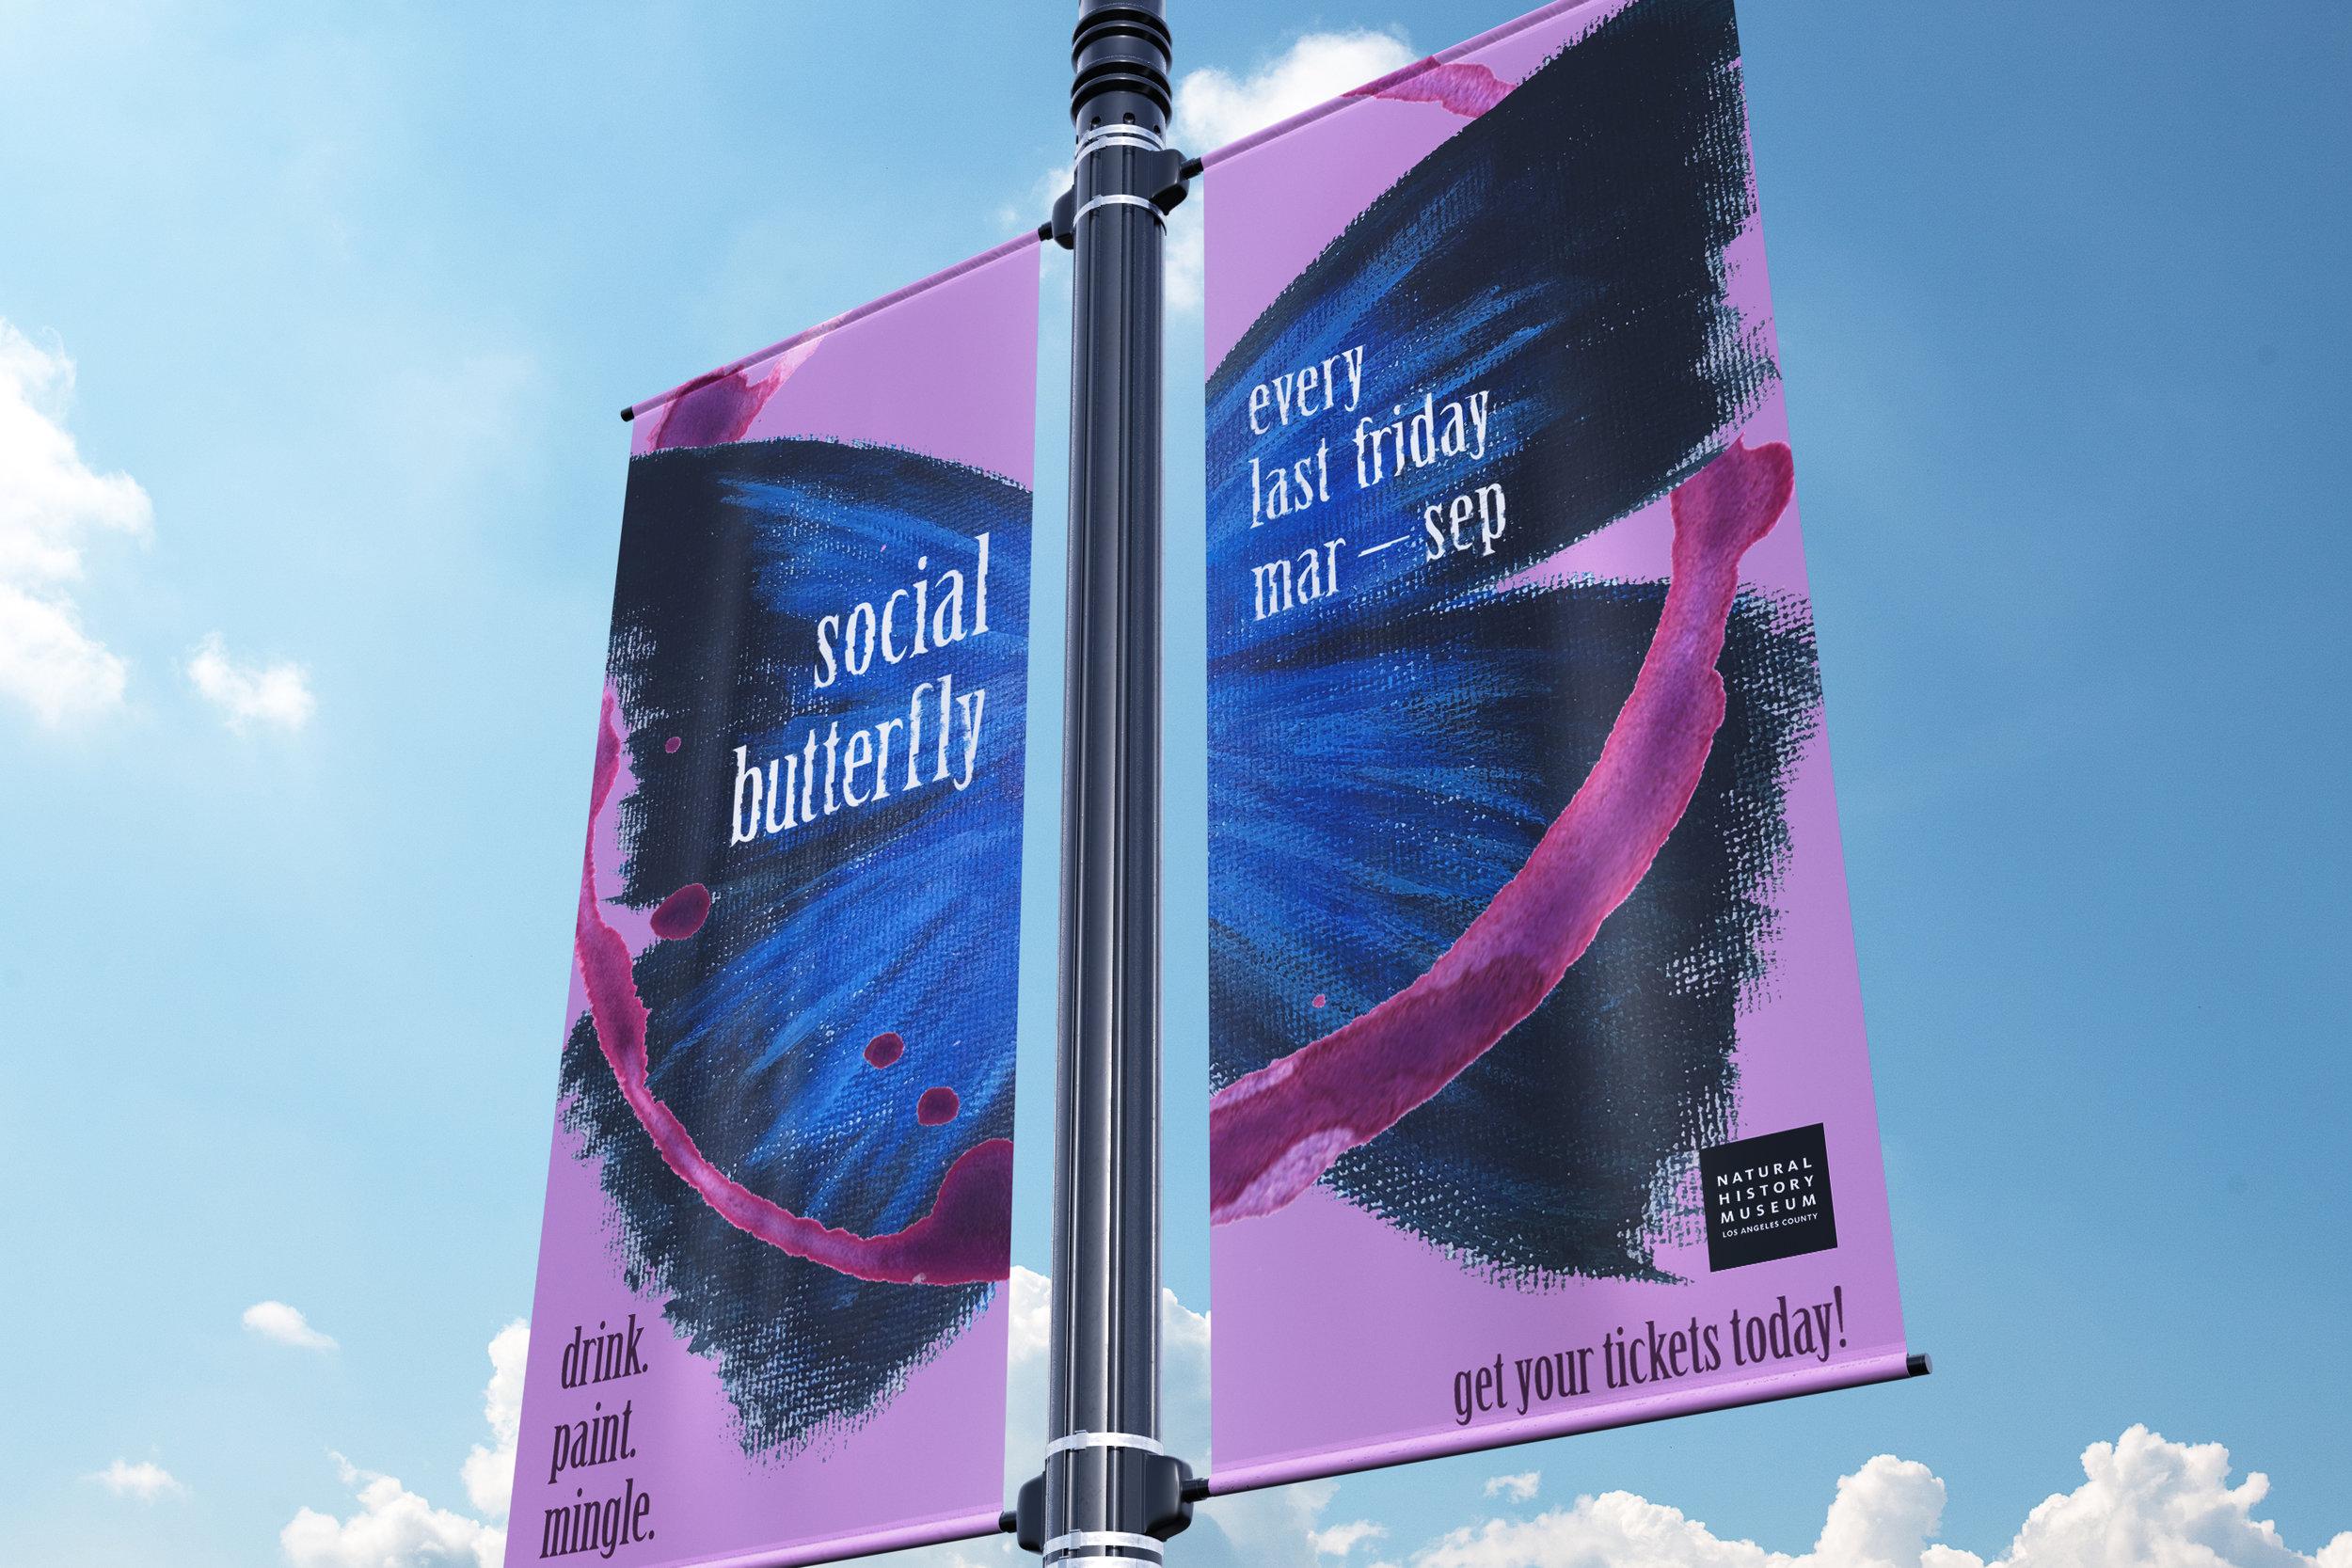 lamppost banners.jpg